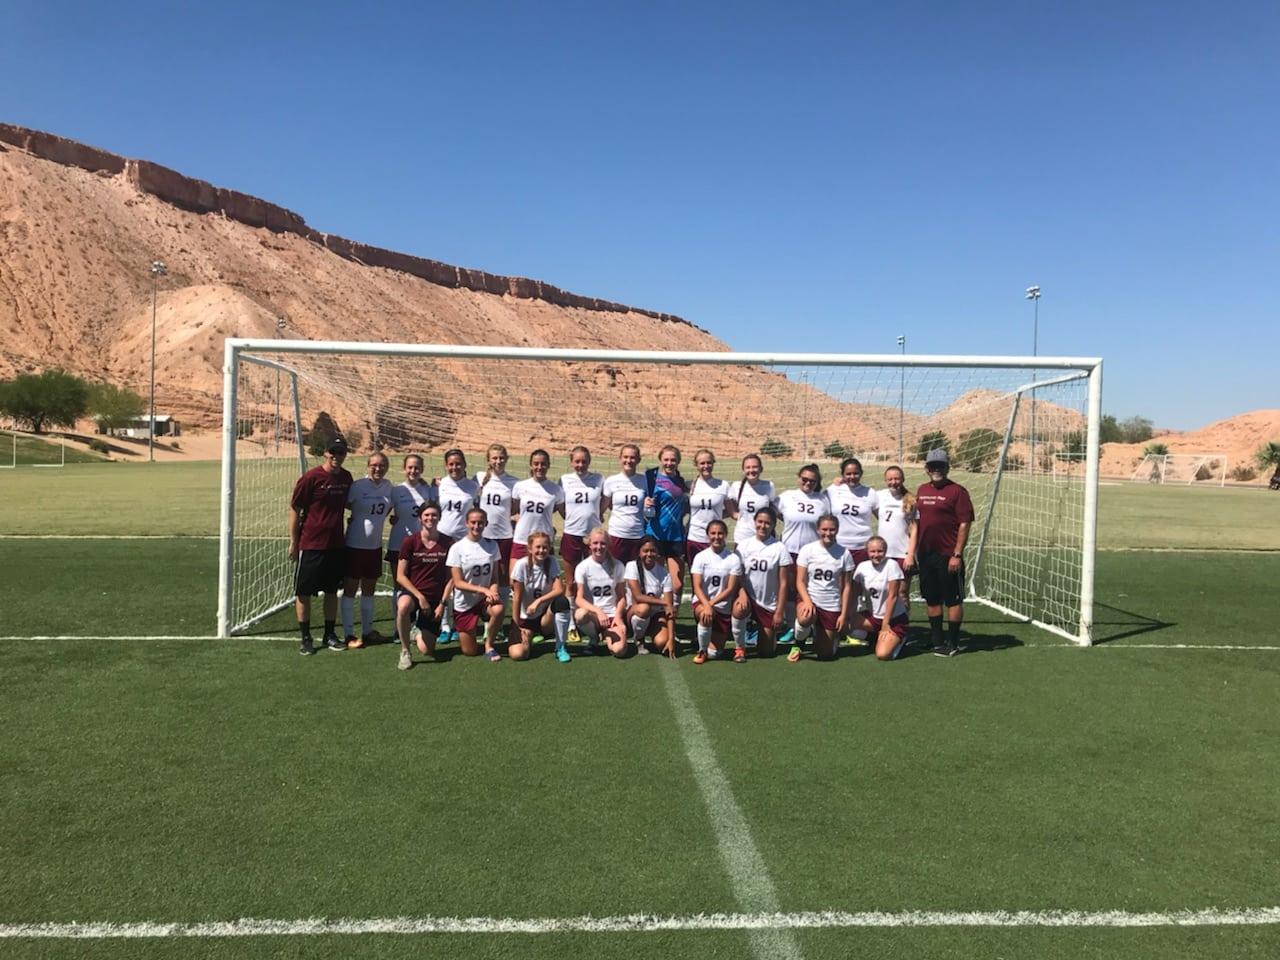 Arizona school wins annual Mesquite Cup